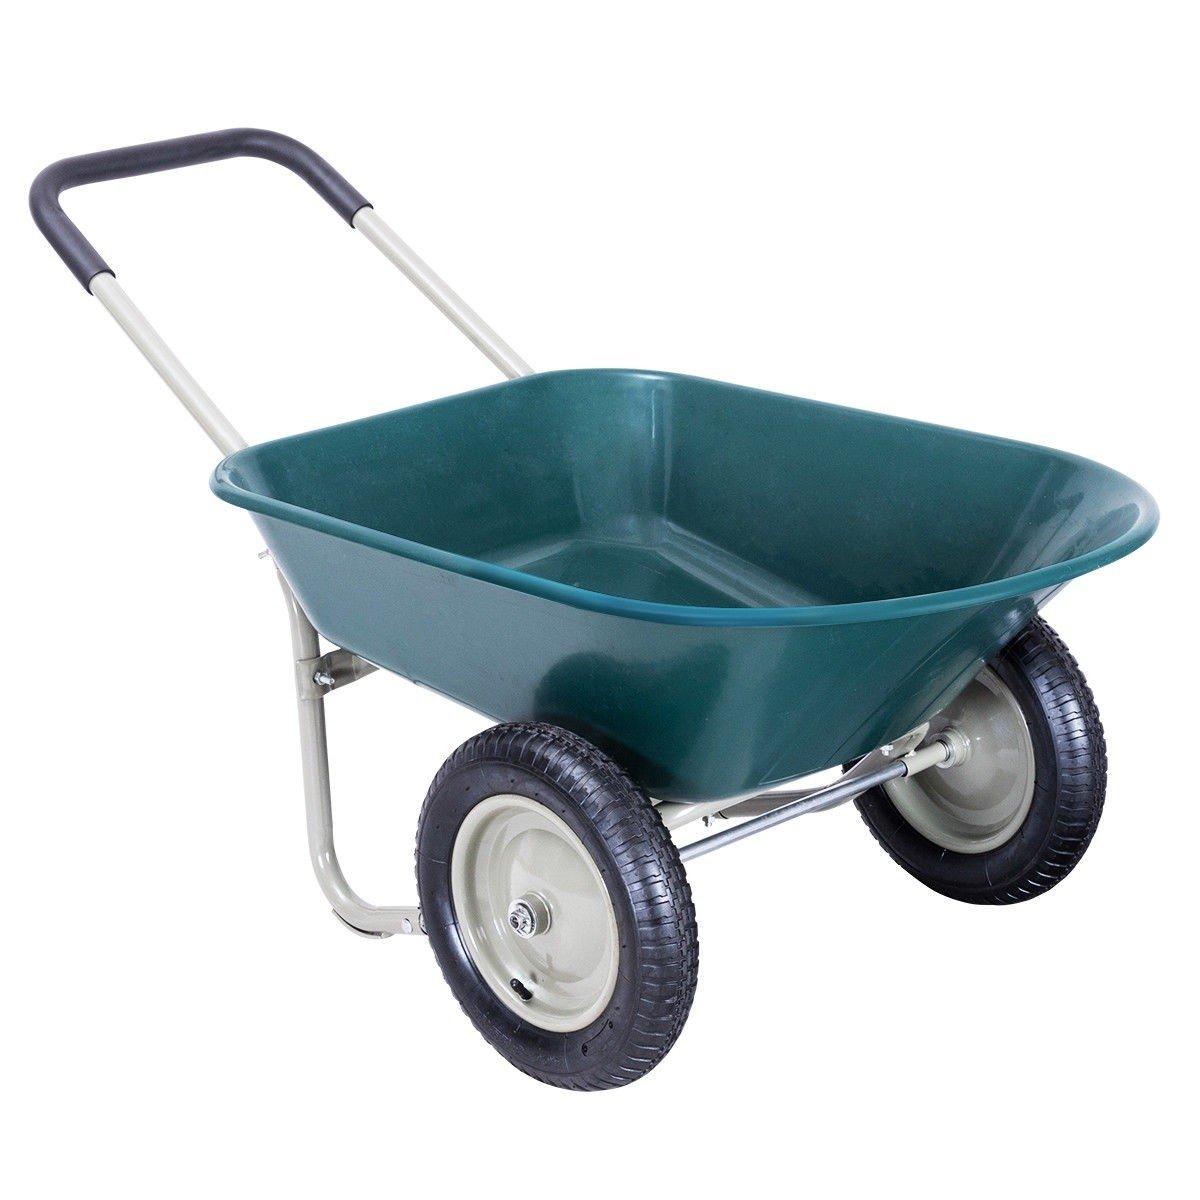 EnjoyShop Heavy Duty 2 Tire Garden Landscape Wagon Wheelbarrow by EnjoyShop